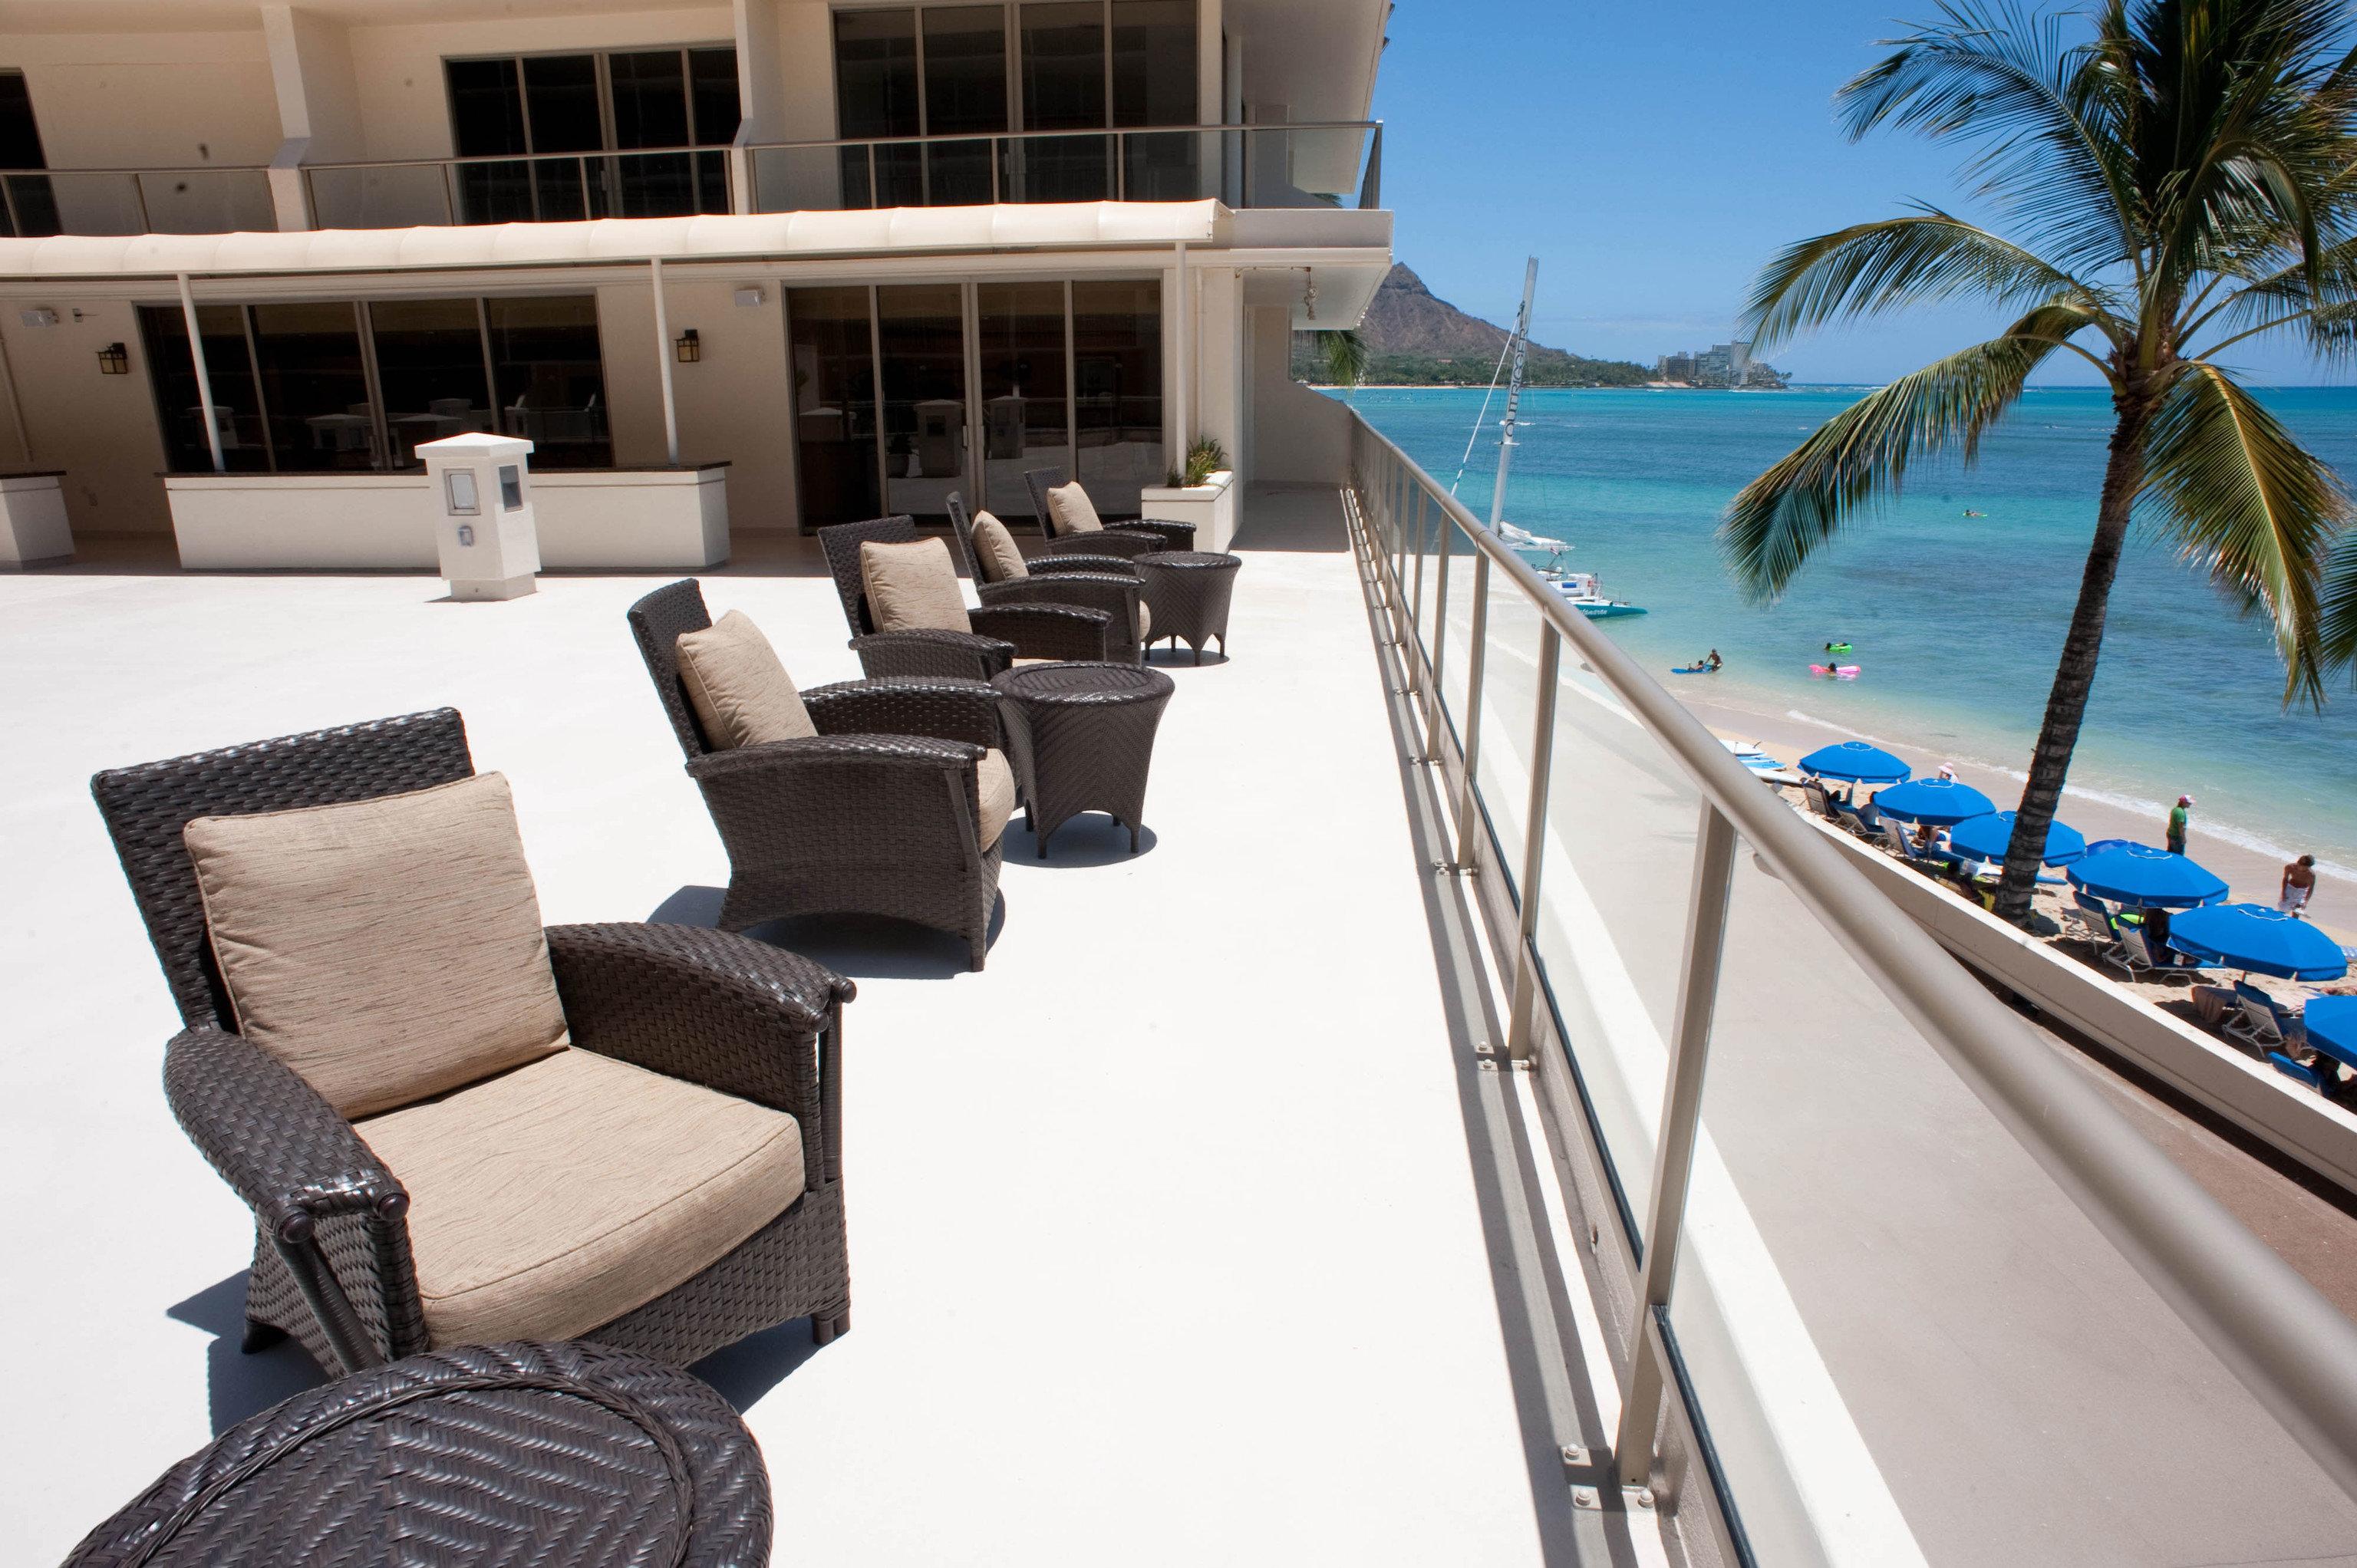 property leisure condominium vehicle Resort Deck